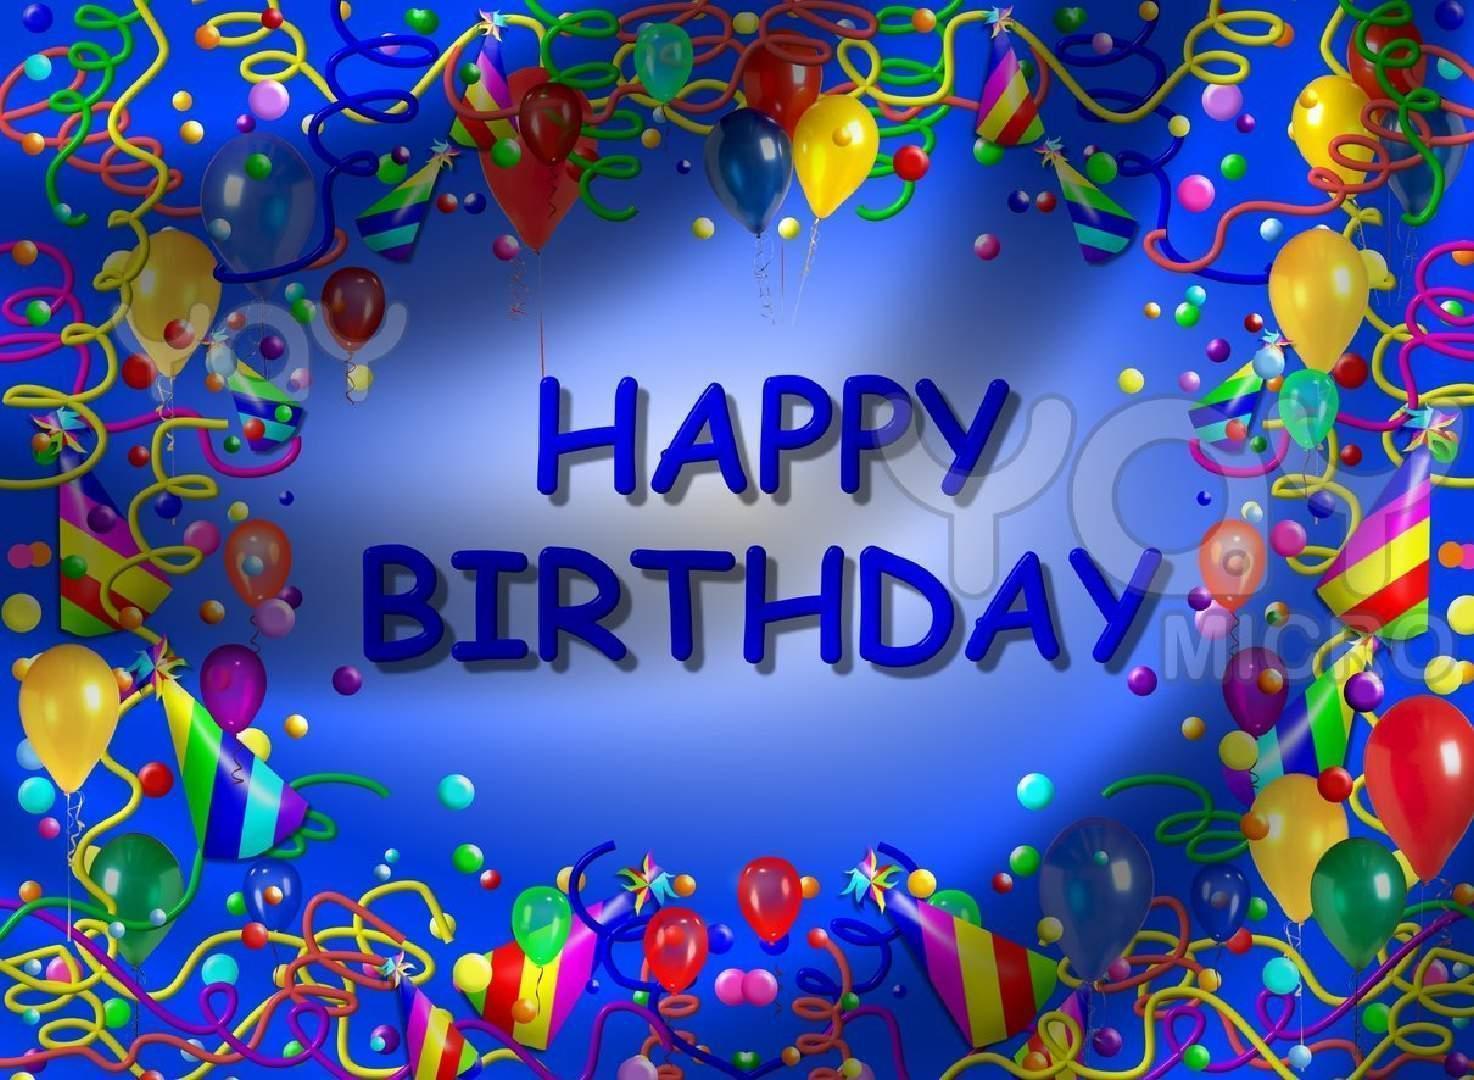 Happy Birthday Wallpapers 1474x1080